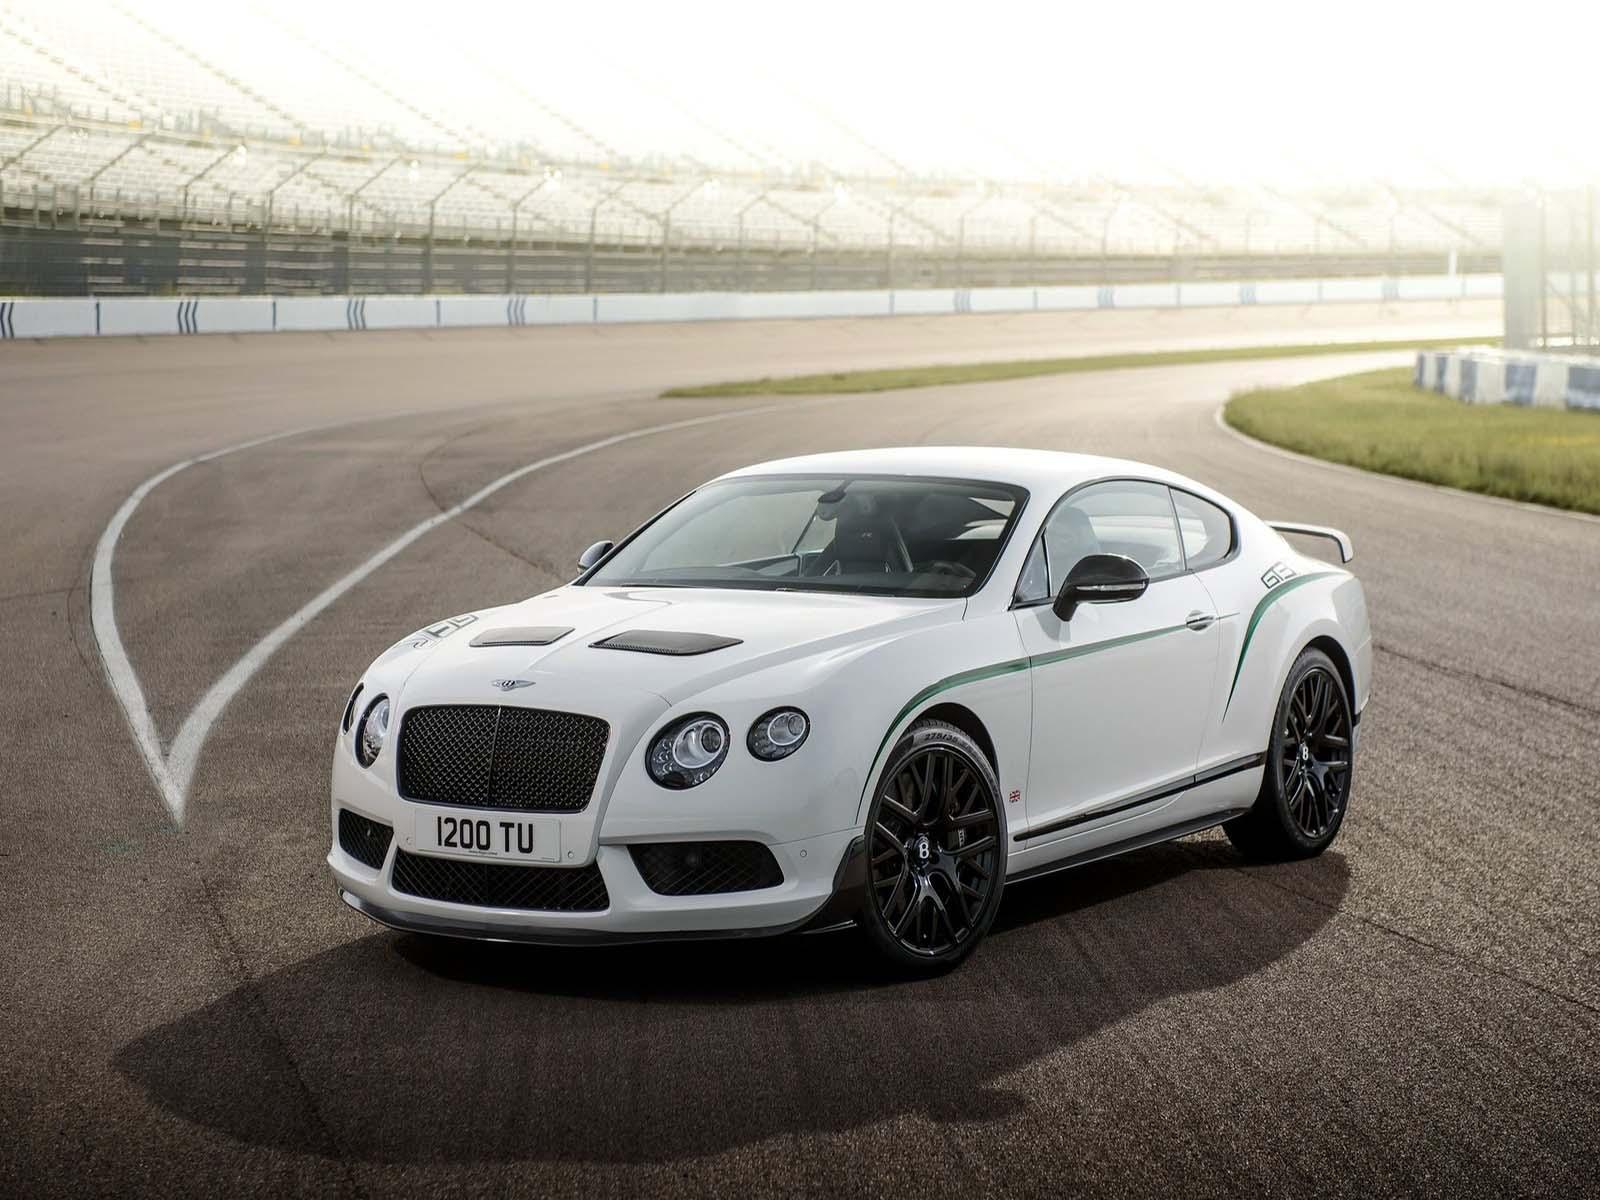 Bentley-Continental-GT-Free-Car-wallpaper-wp4236-1